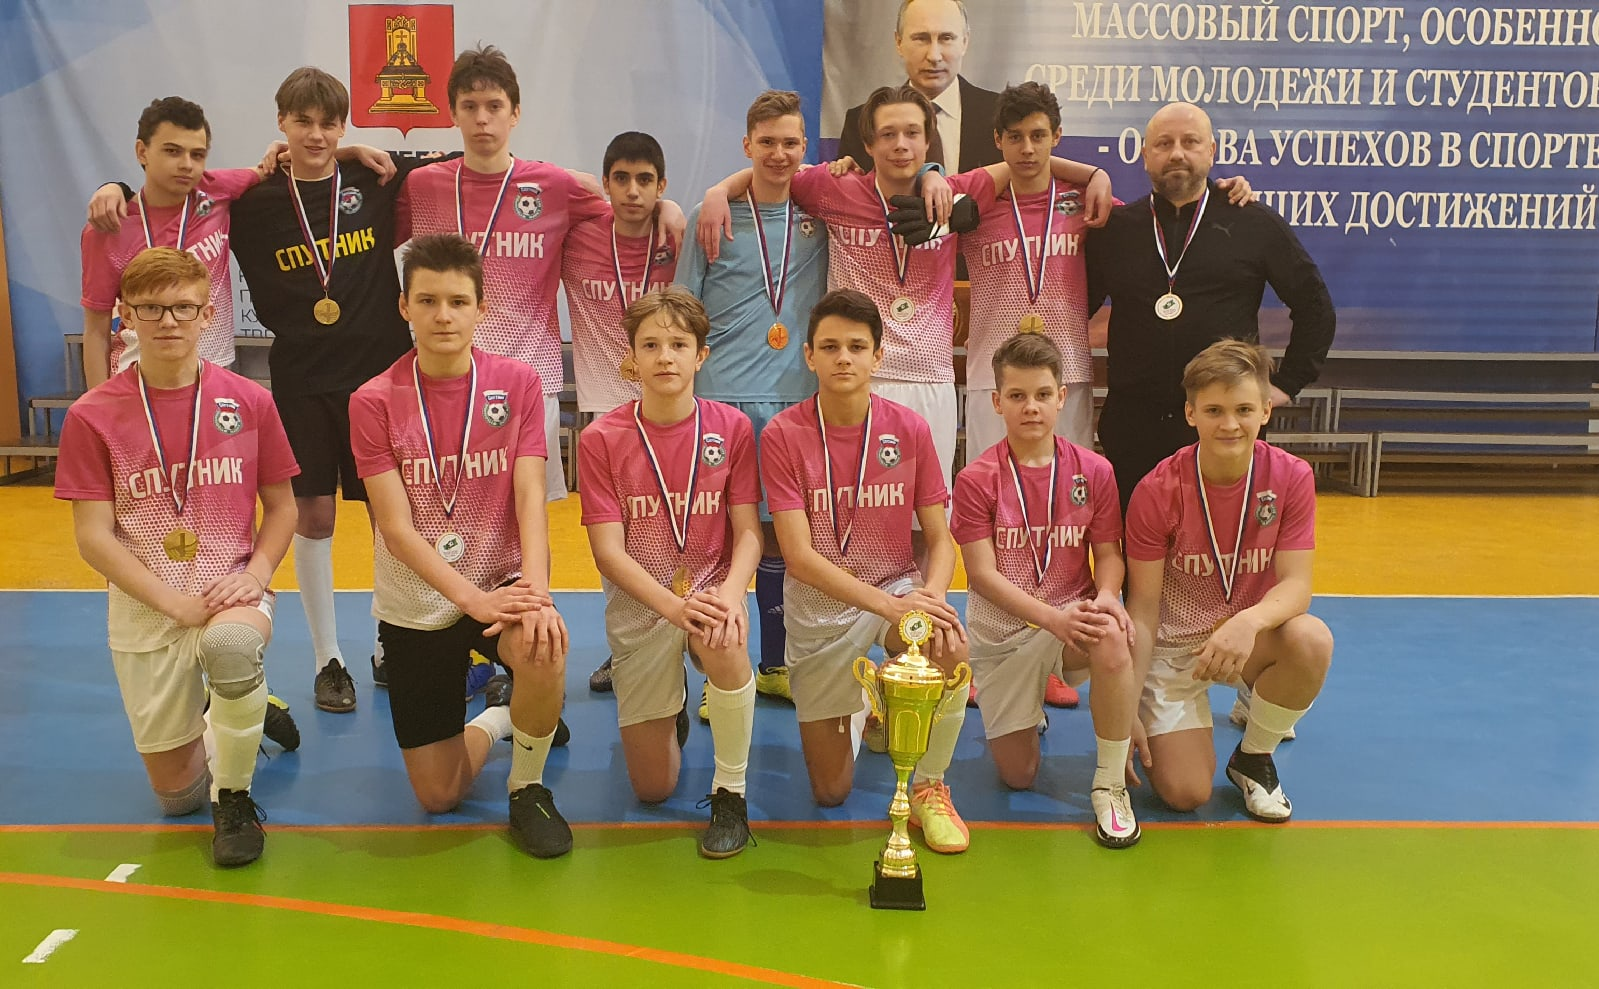 Кимрский «Спутник» завоевал золото первенства области по мини-футболу